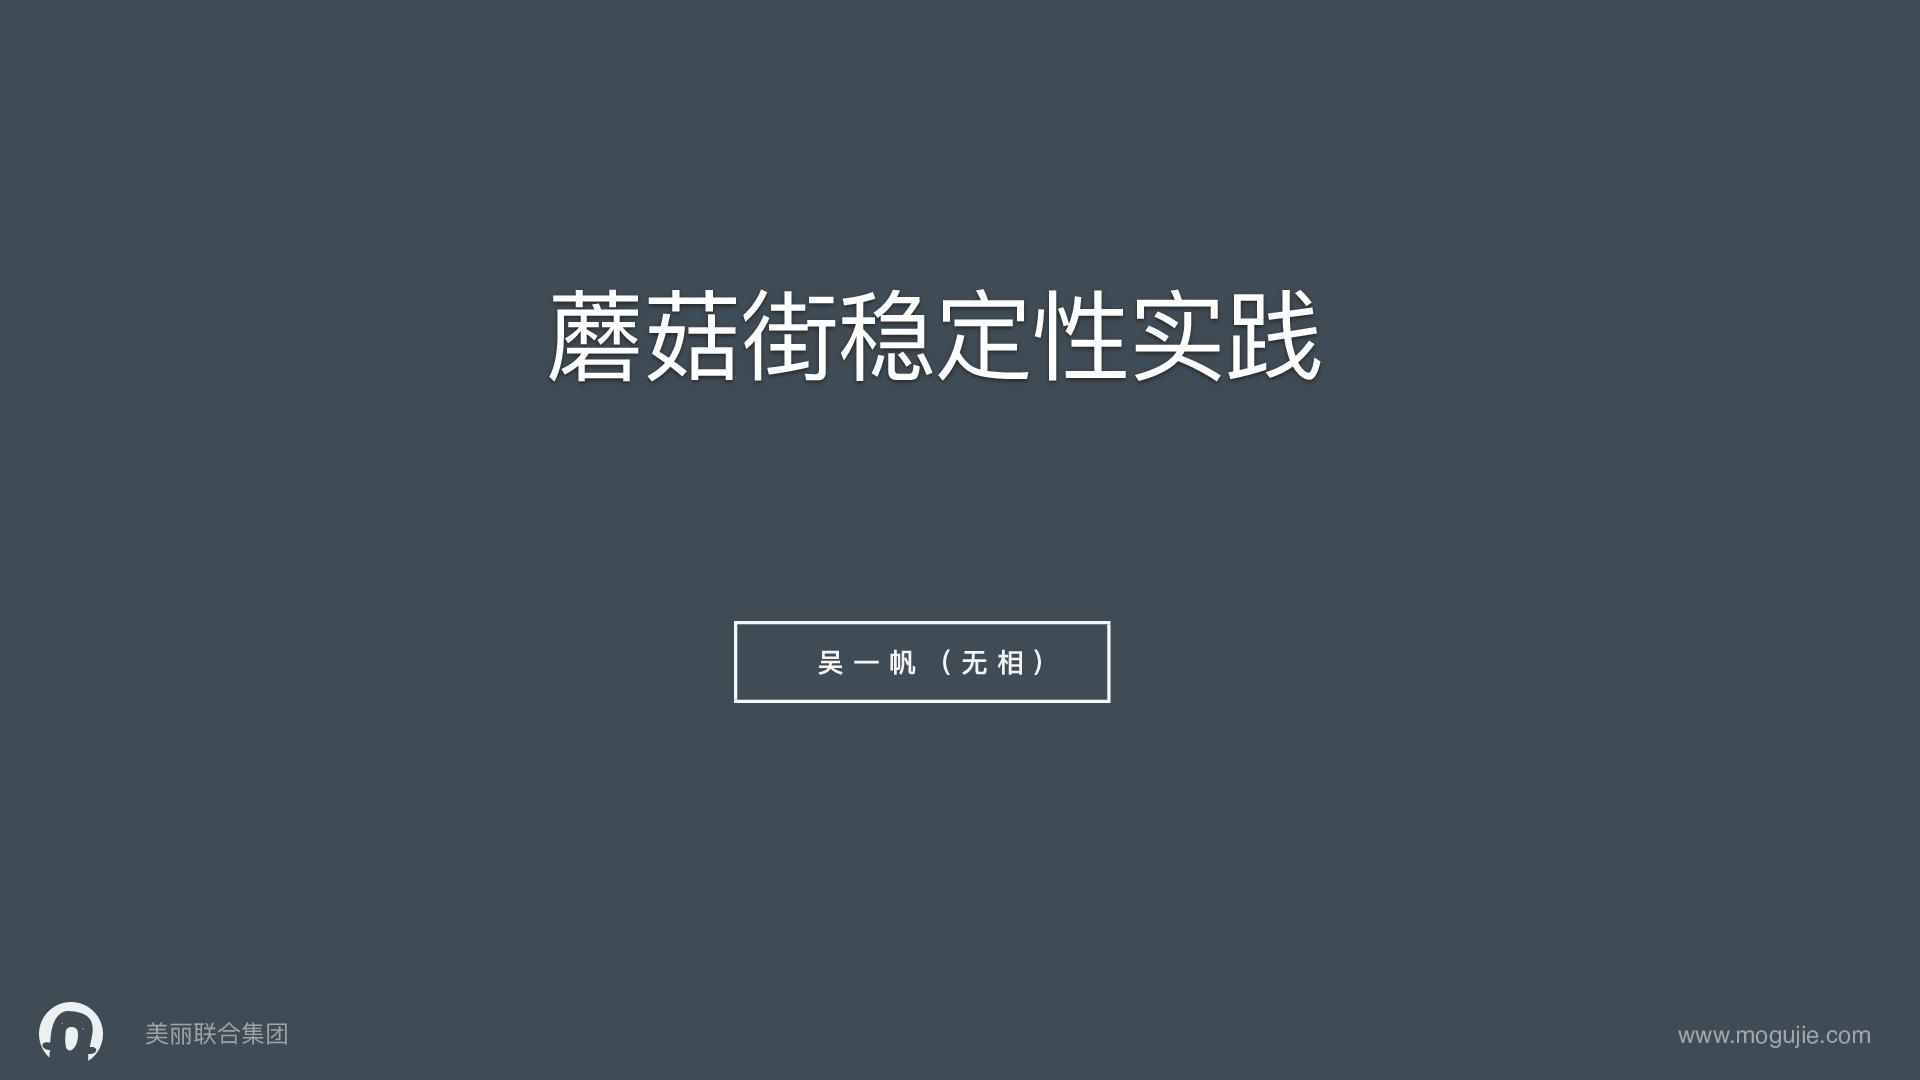 https://opentalk-blog.b0.upaiyun.com/prod/2017-10-31/e5258be4b4d3d5657ae31f249bb4b50e